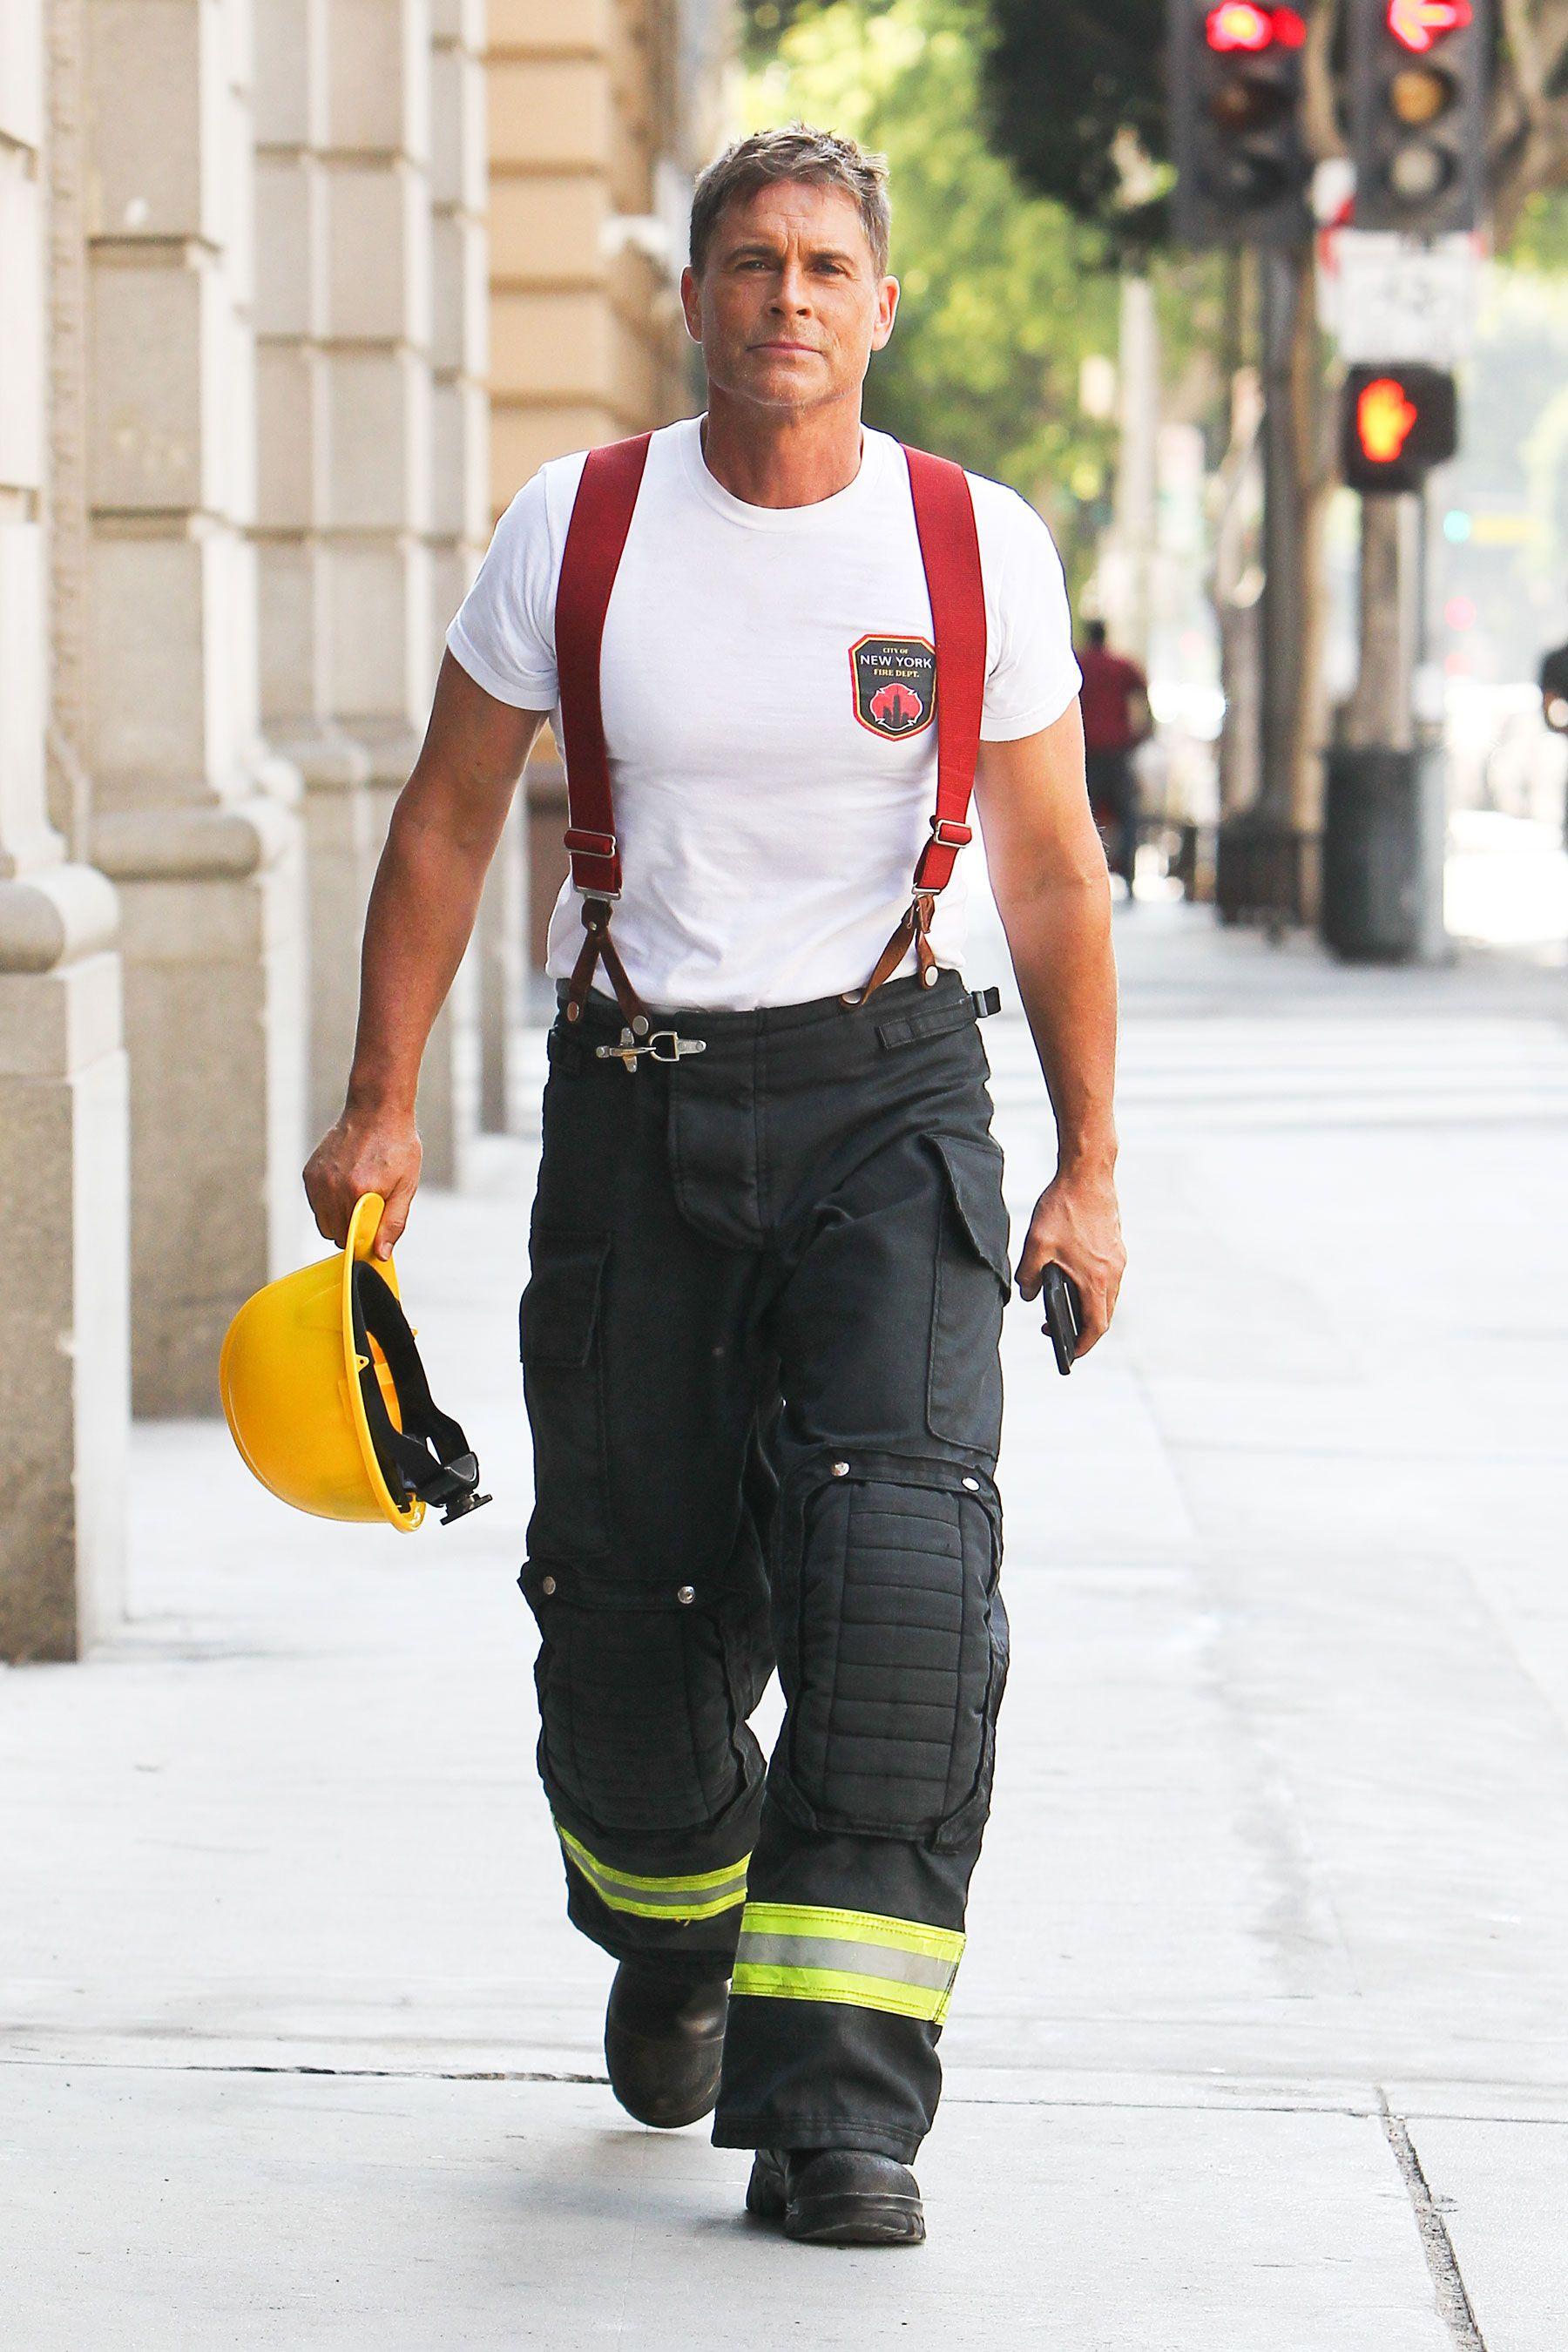 Rob Lowe Heats Up the 911: Lone Star Set, Plus Charlize Theron, Rihanna & More